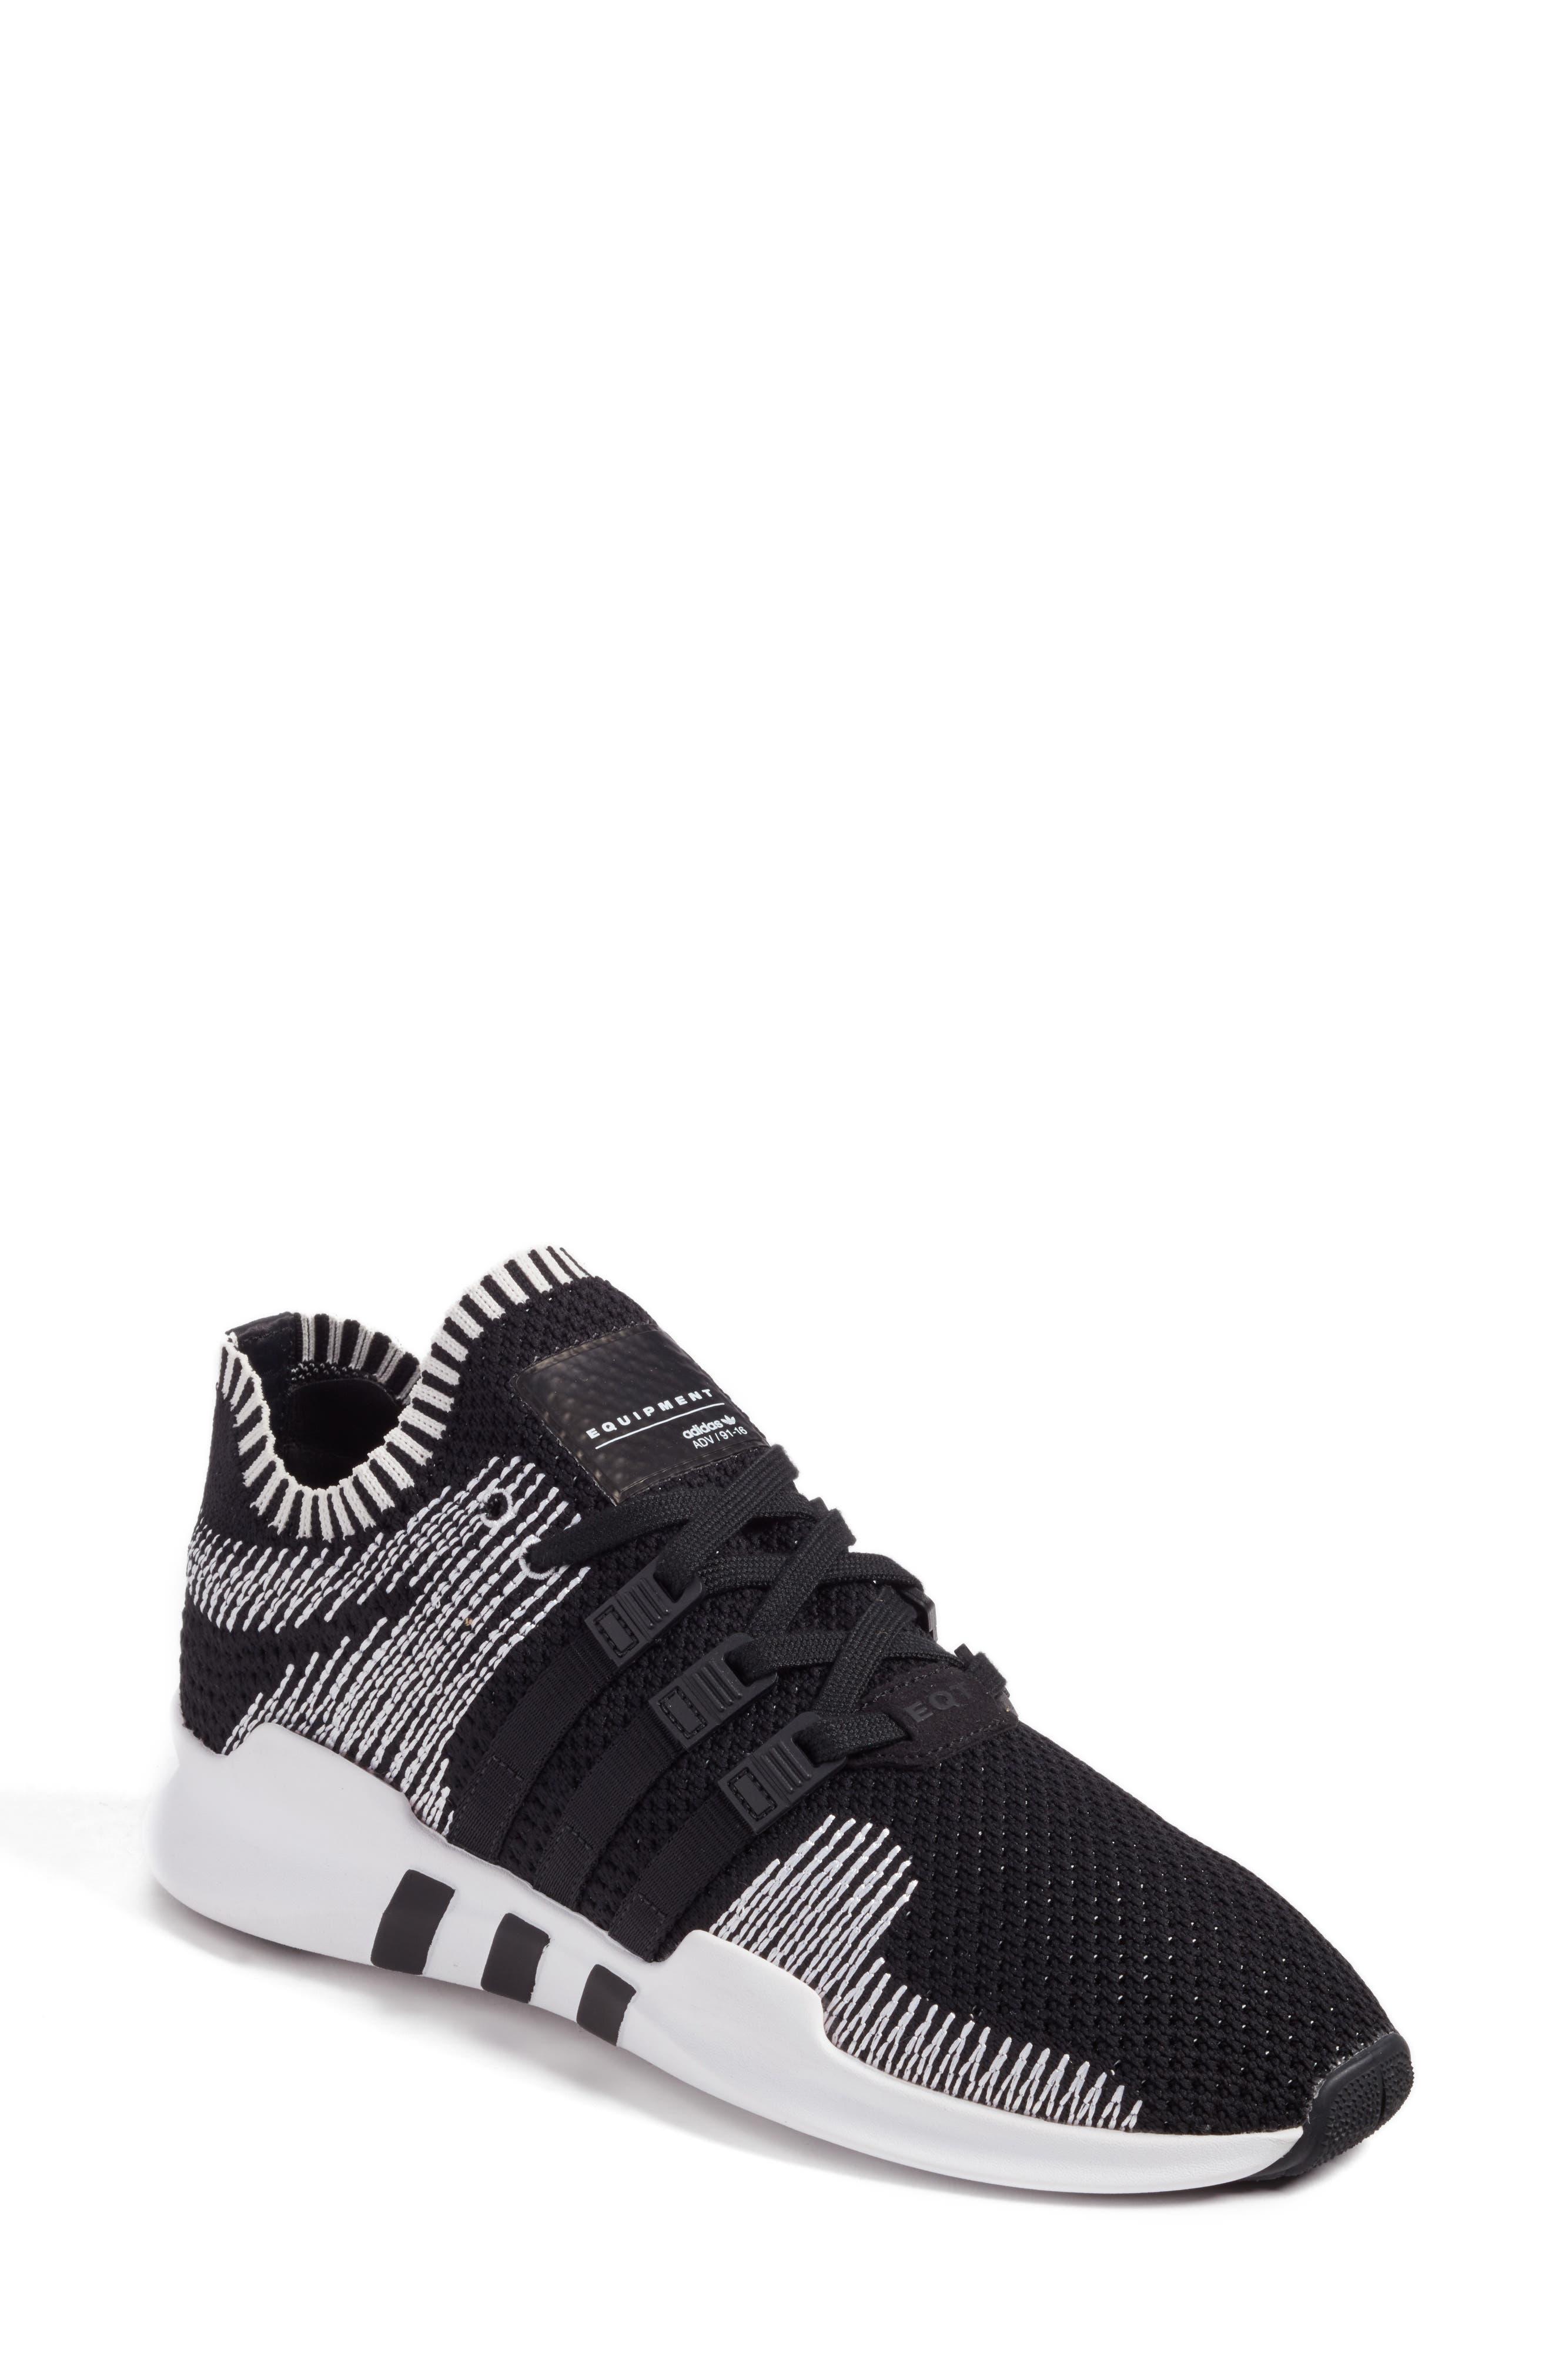 adidas EQT Support ADV PK Sneaker (Women)